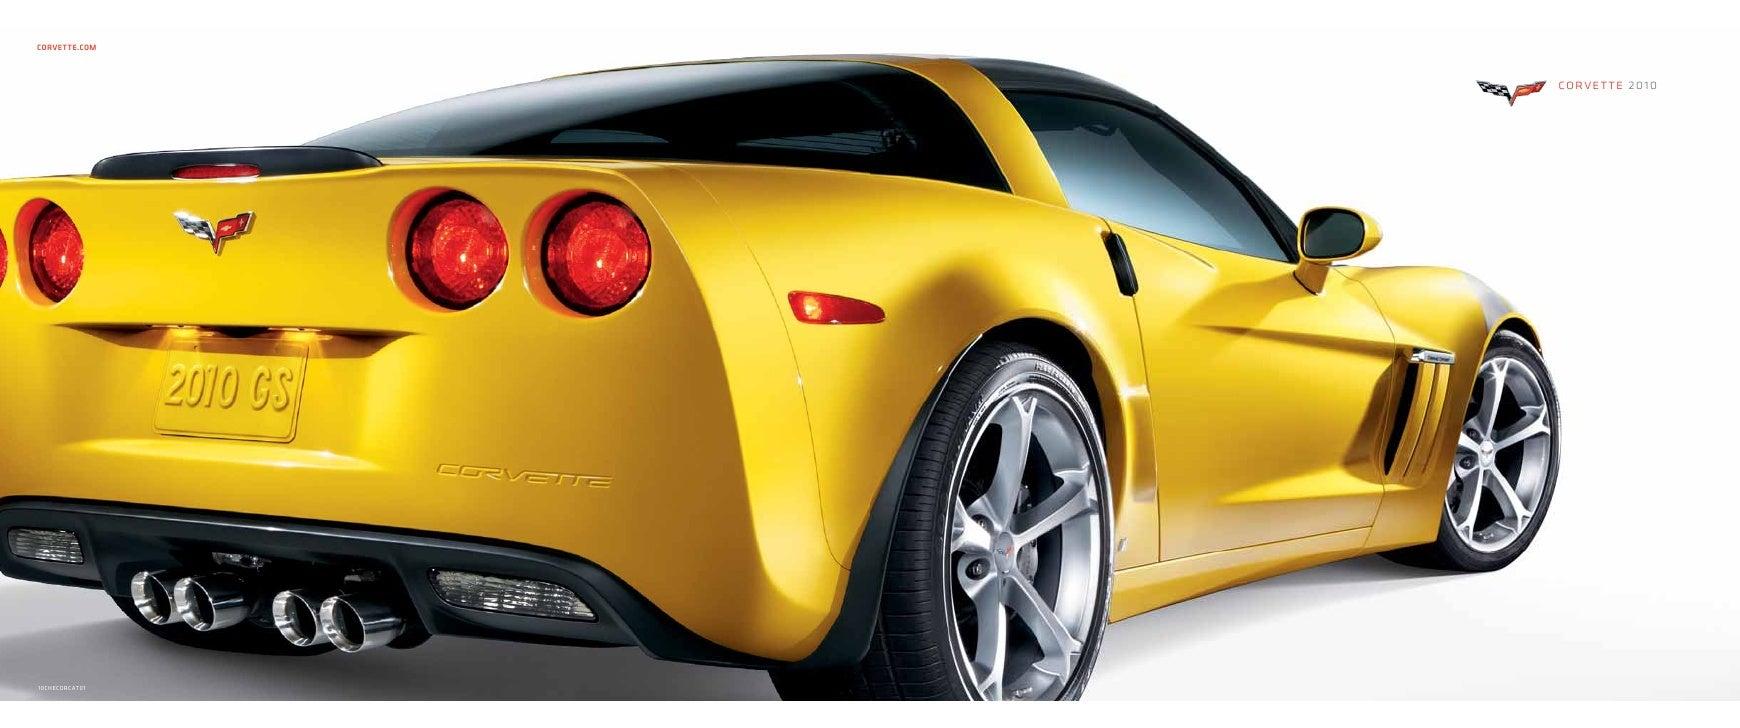 2010 Chevrolet Corvette Sports Car Brochure